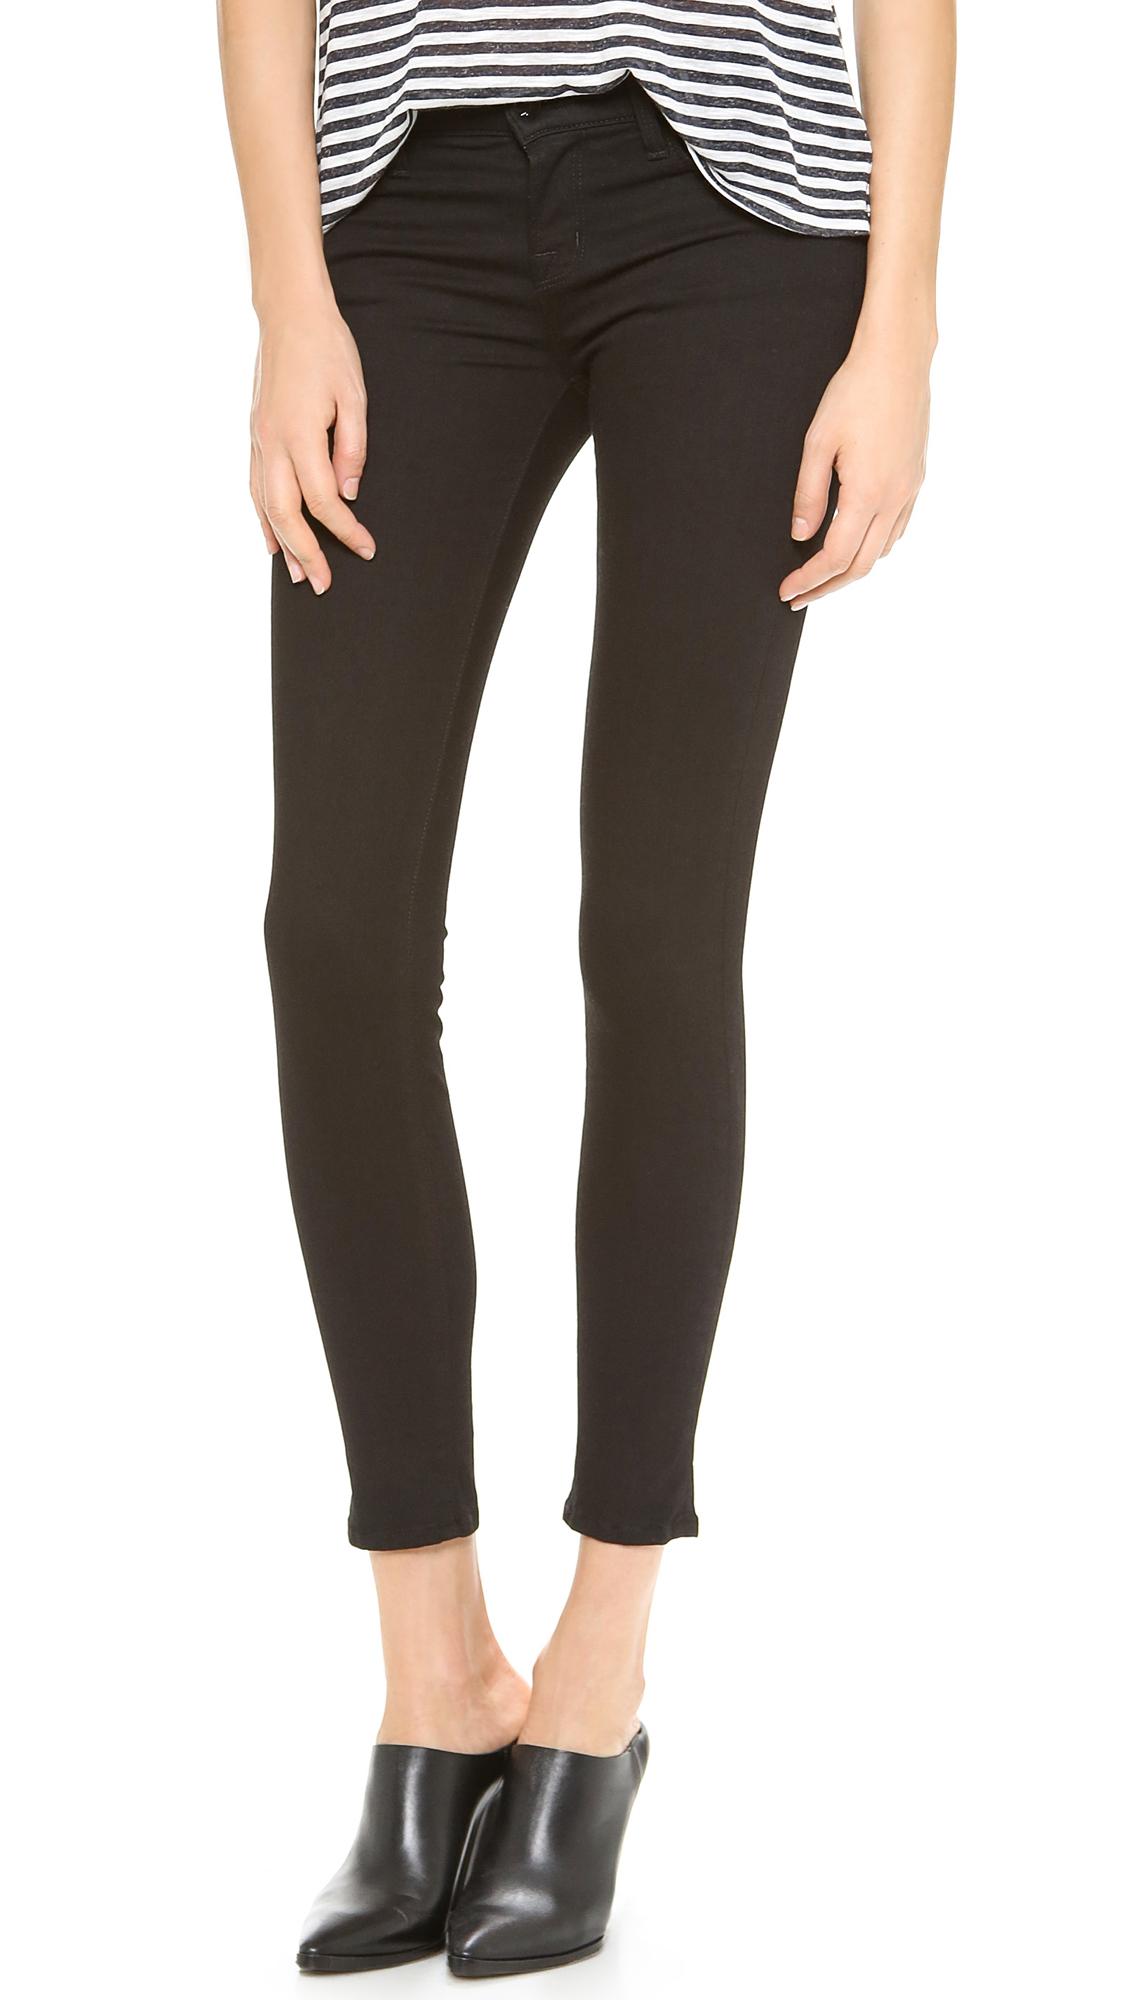 girls's dress pants tall sizes